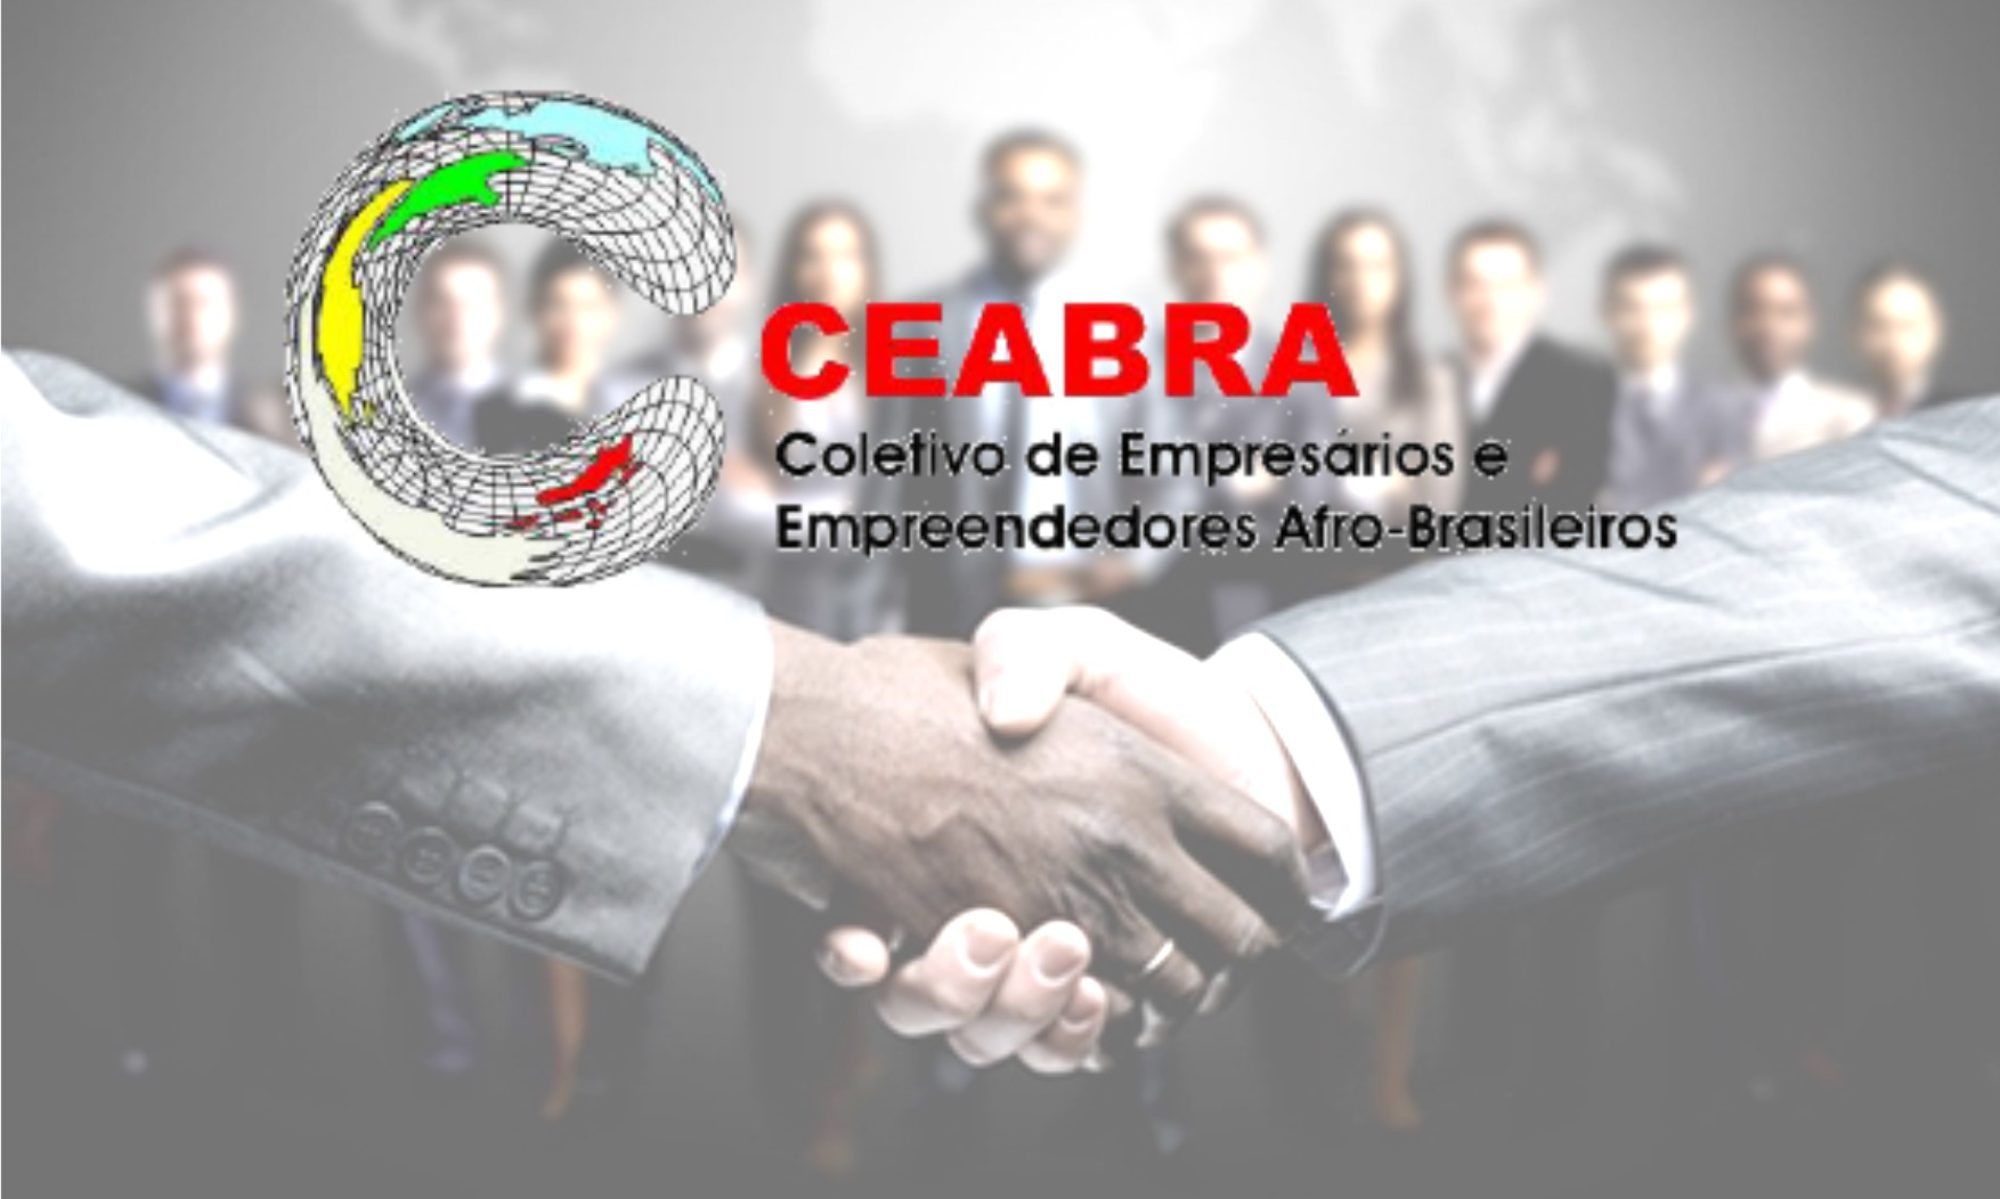 CEABRA - coletivo de empresários e empreededores afro brasileiros